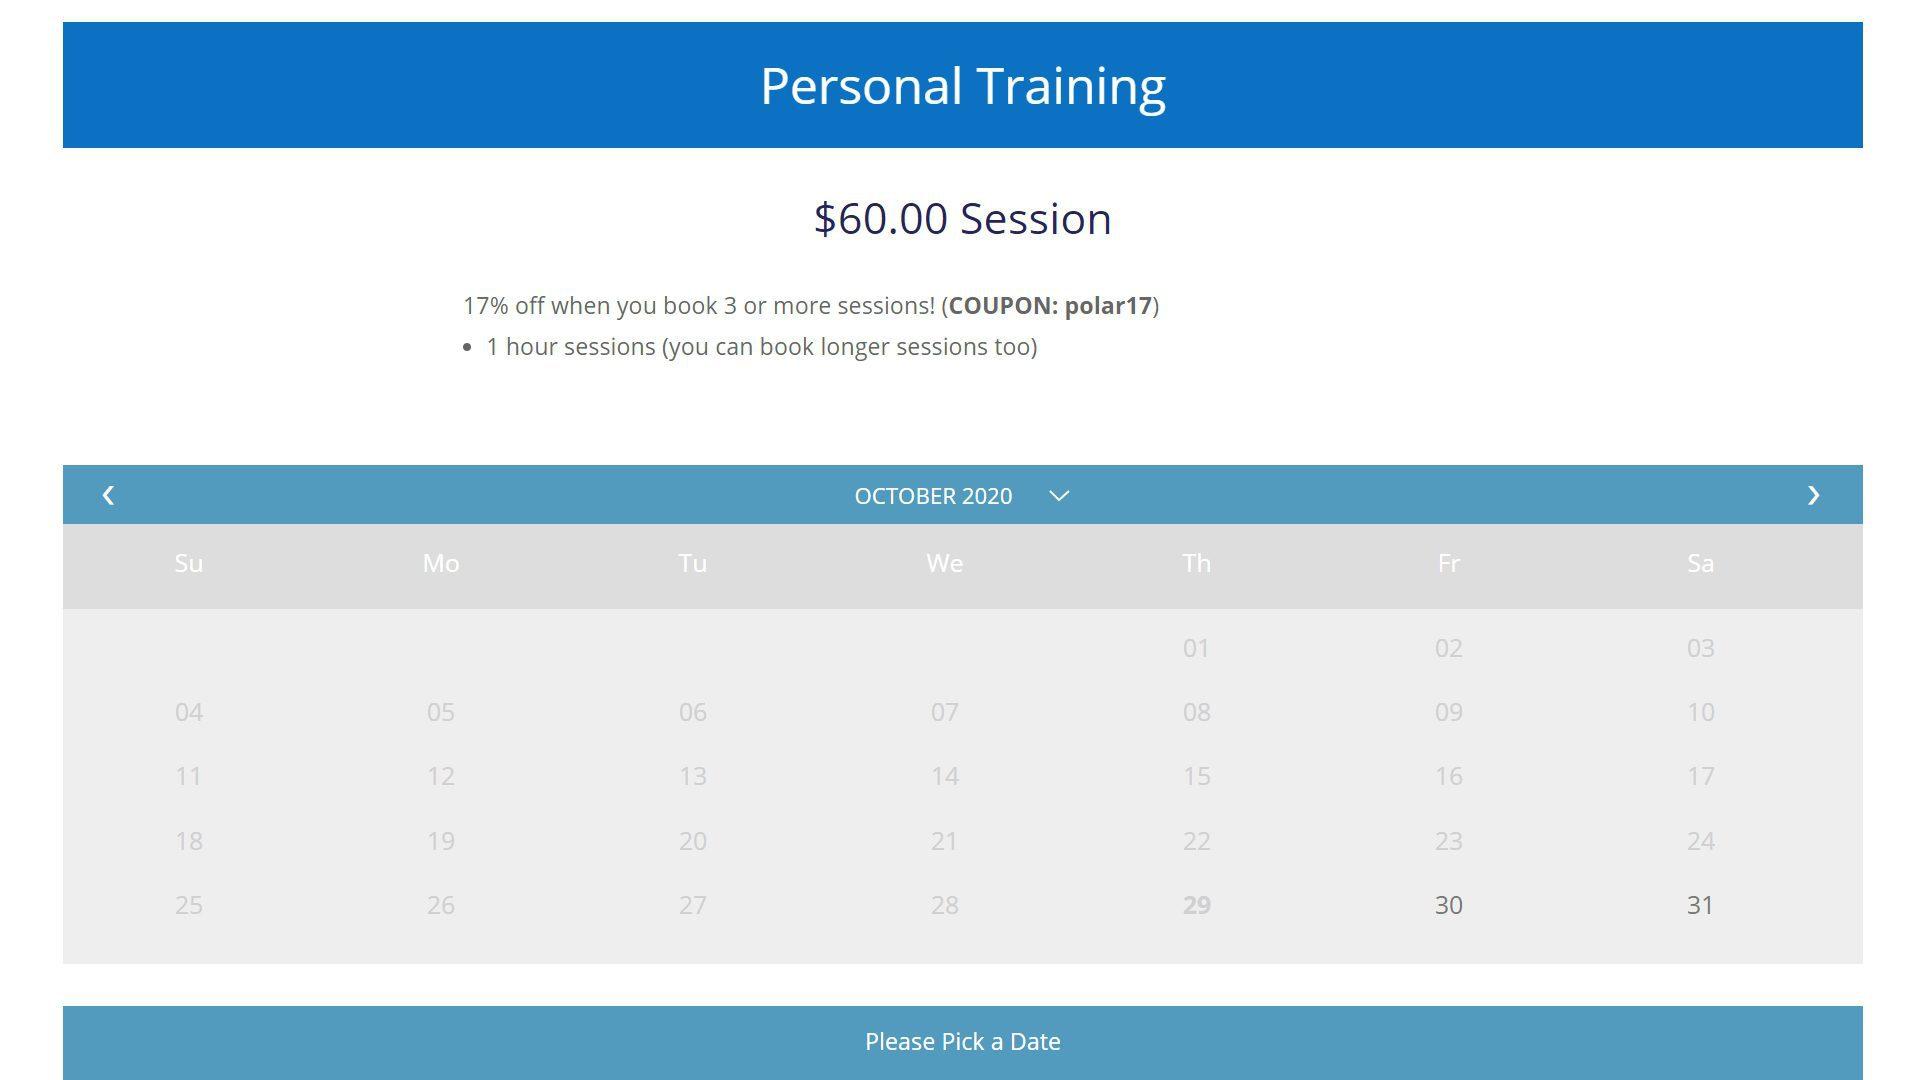 Polar Fitness eCommerce Personal Training Booking Calendar (1)